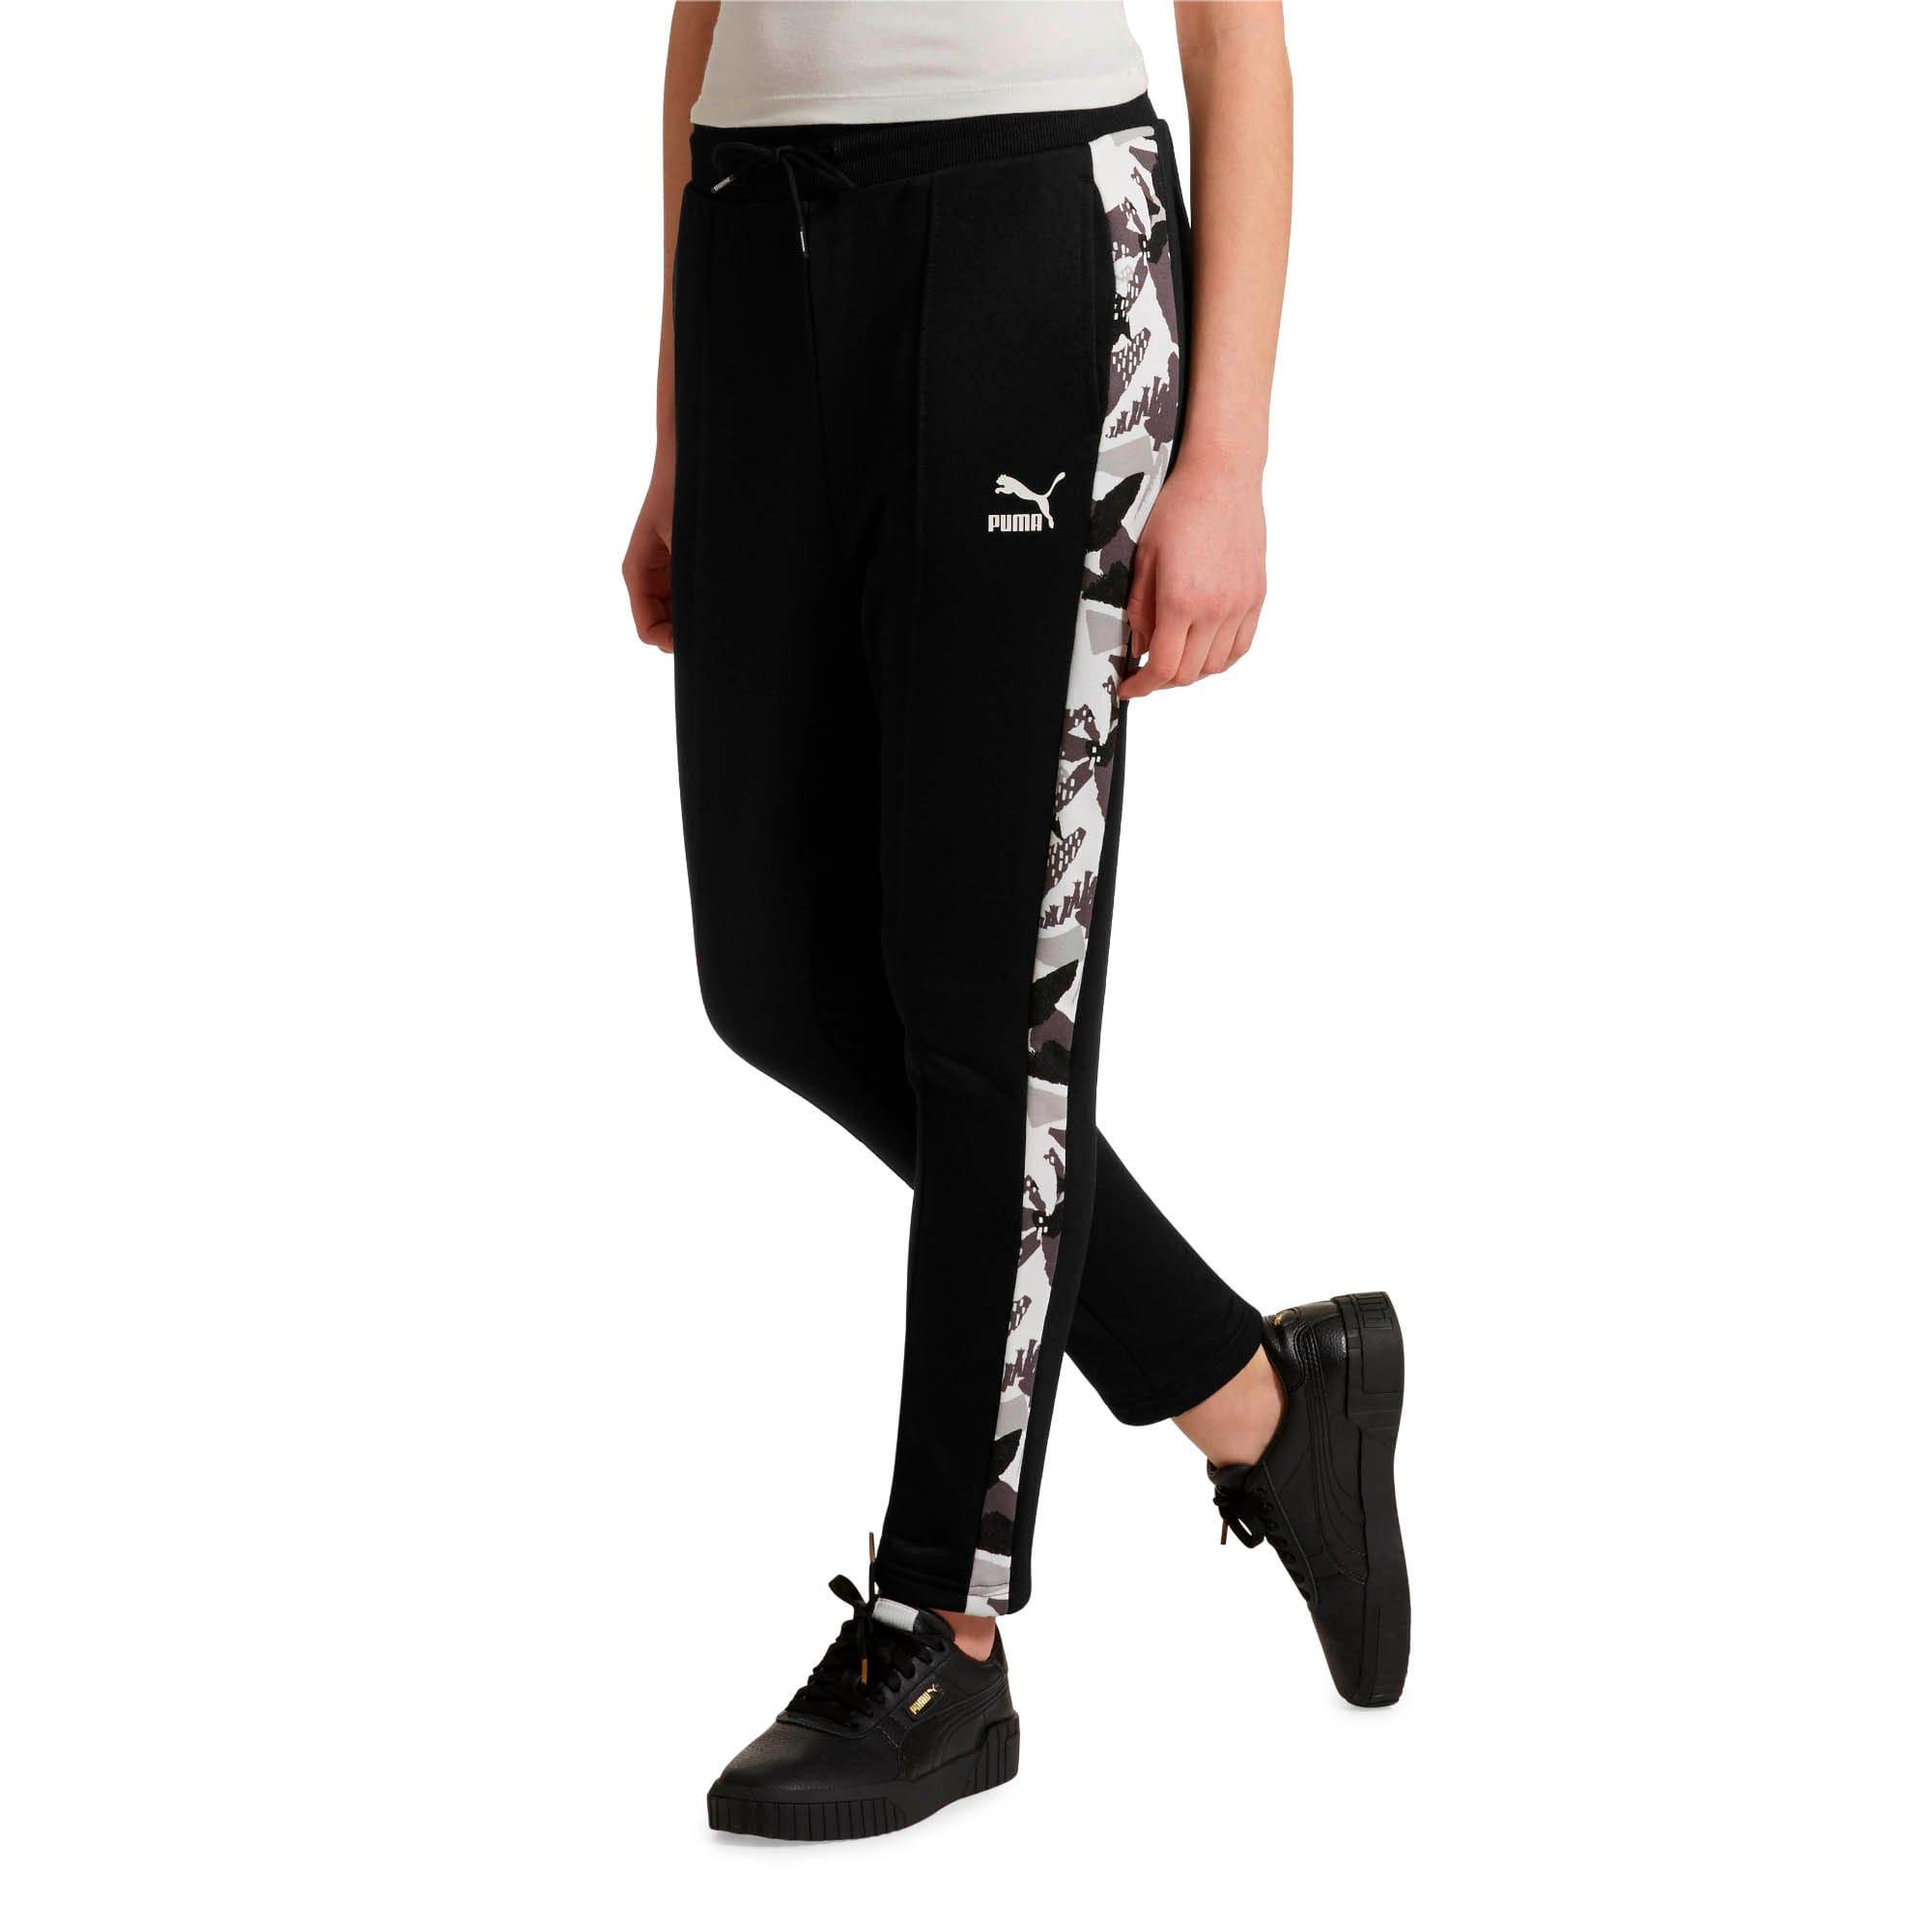 Miniatura 2 de Pantalones deportivos ClassicsAOP T7 para mujer, Puma Black, mediano